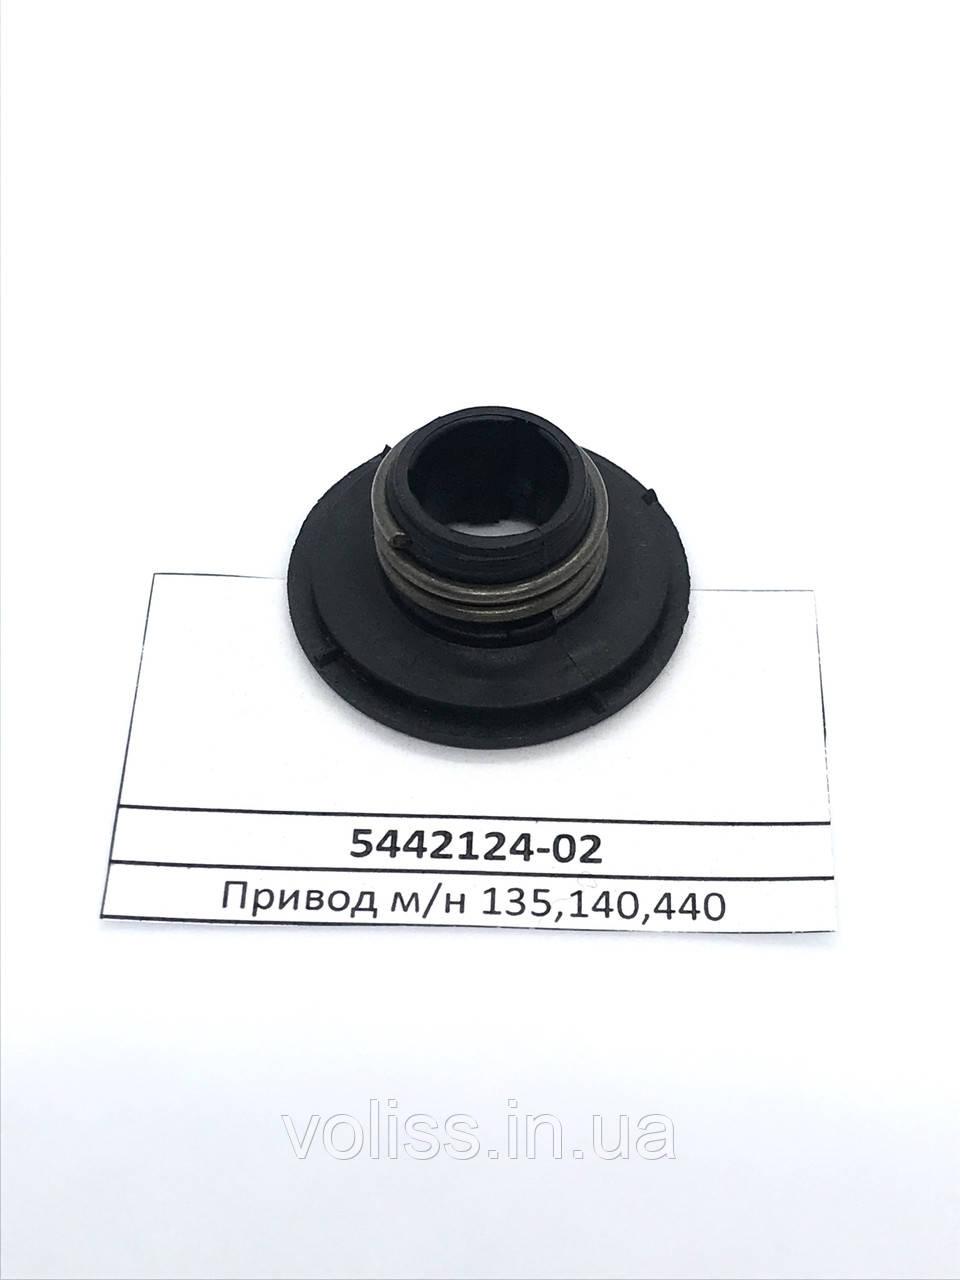 Привод маслонасоса бензопилы Husqvarna 135, 140, 440 (5442124-02)